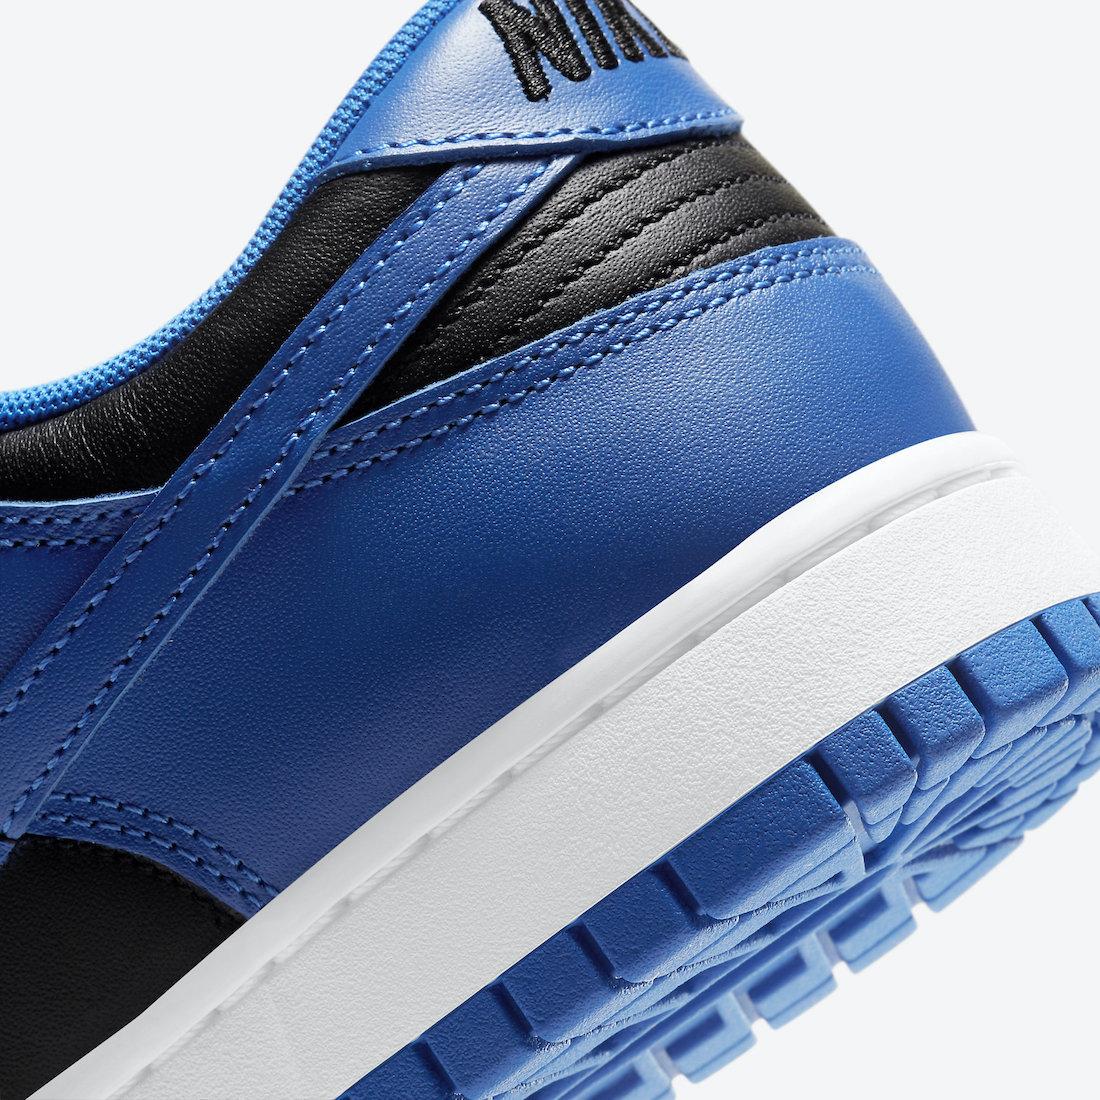 Nike-Dunk-Low-Hyper-Cobalt-DD1391-001-Release-Date-Price-7